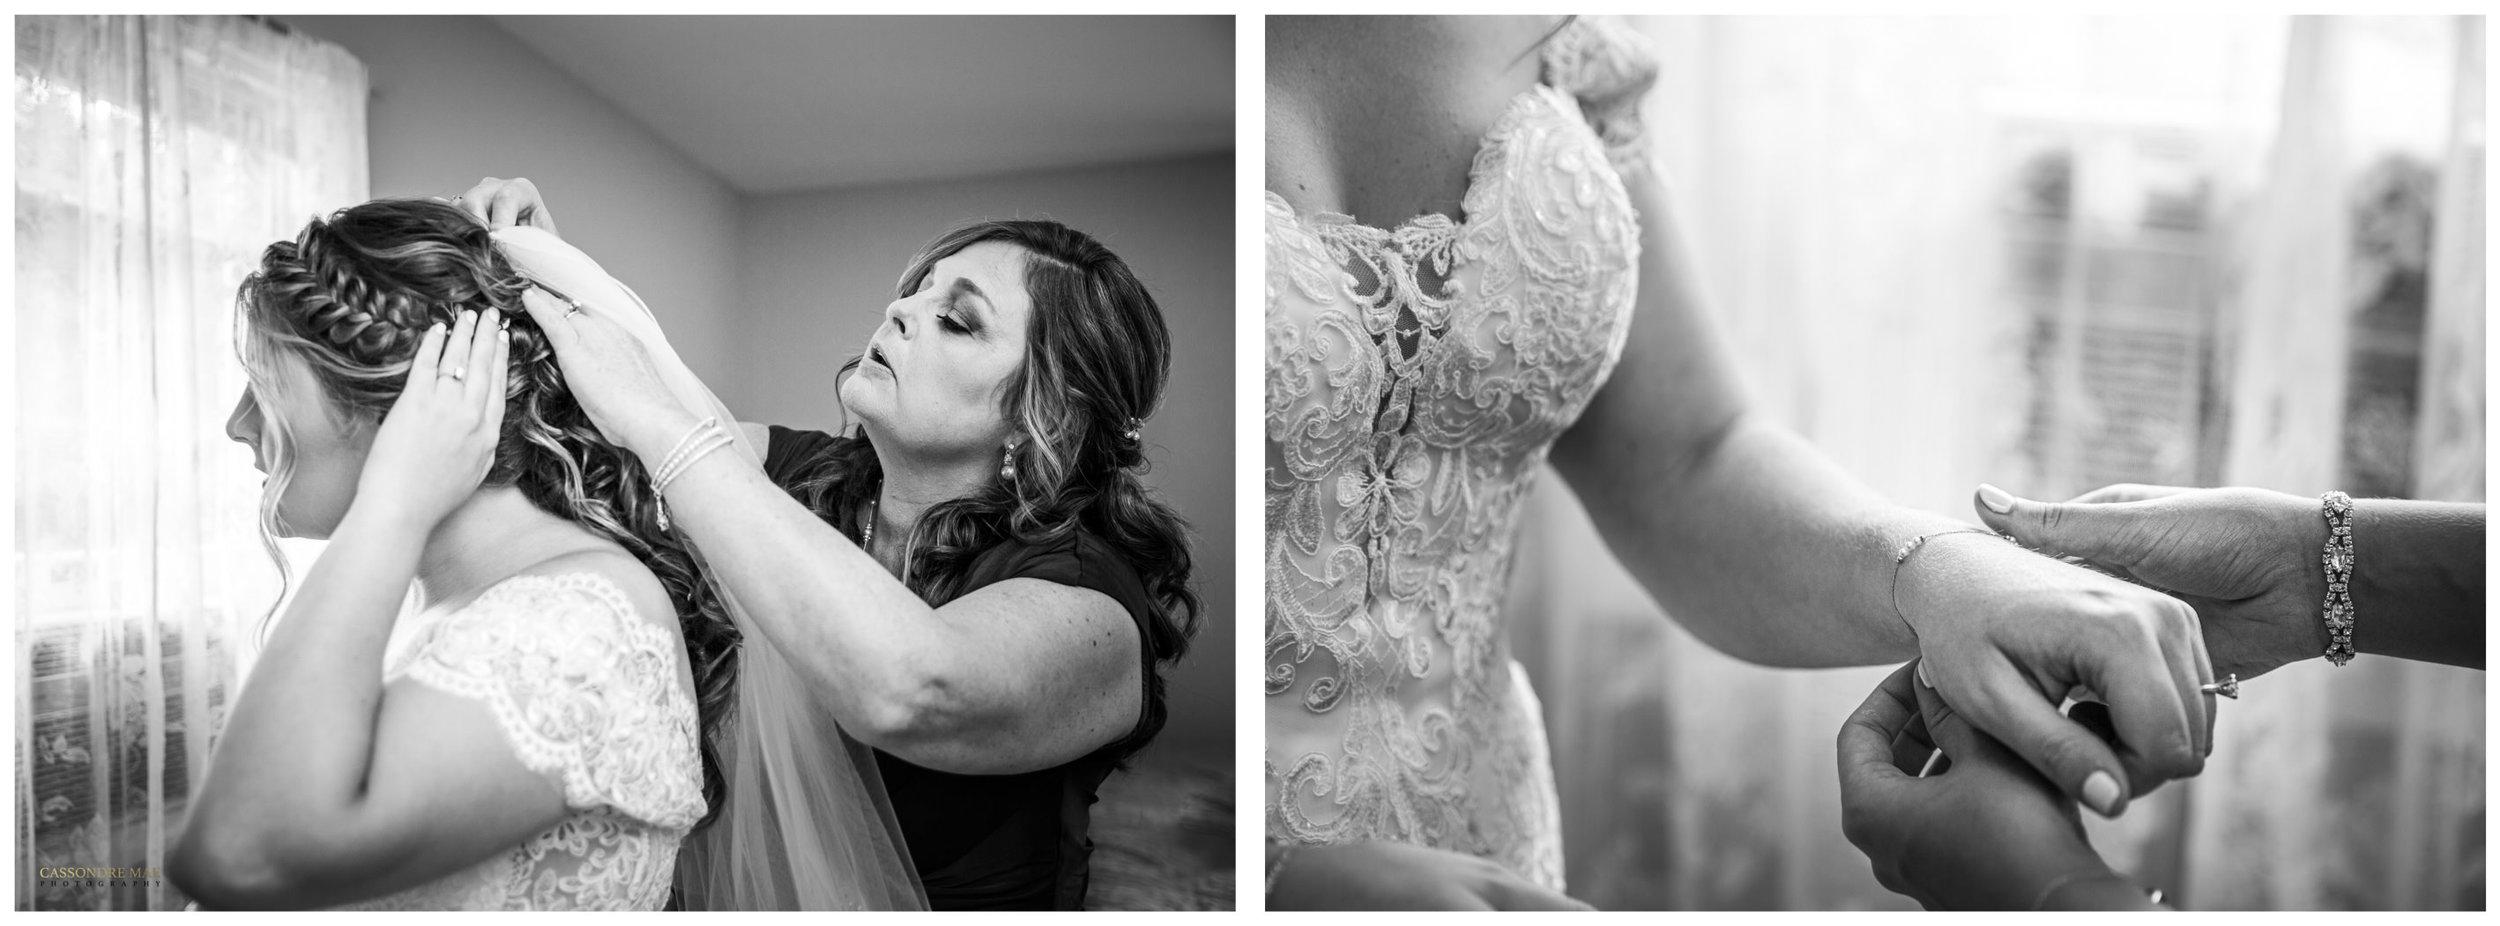 Cassondre Mae Photography The Links Wedding Photographer 9.jpg